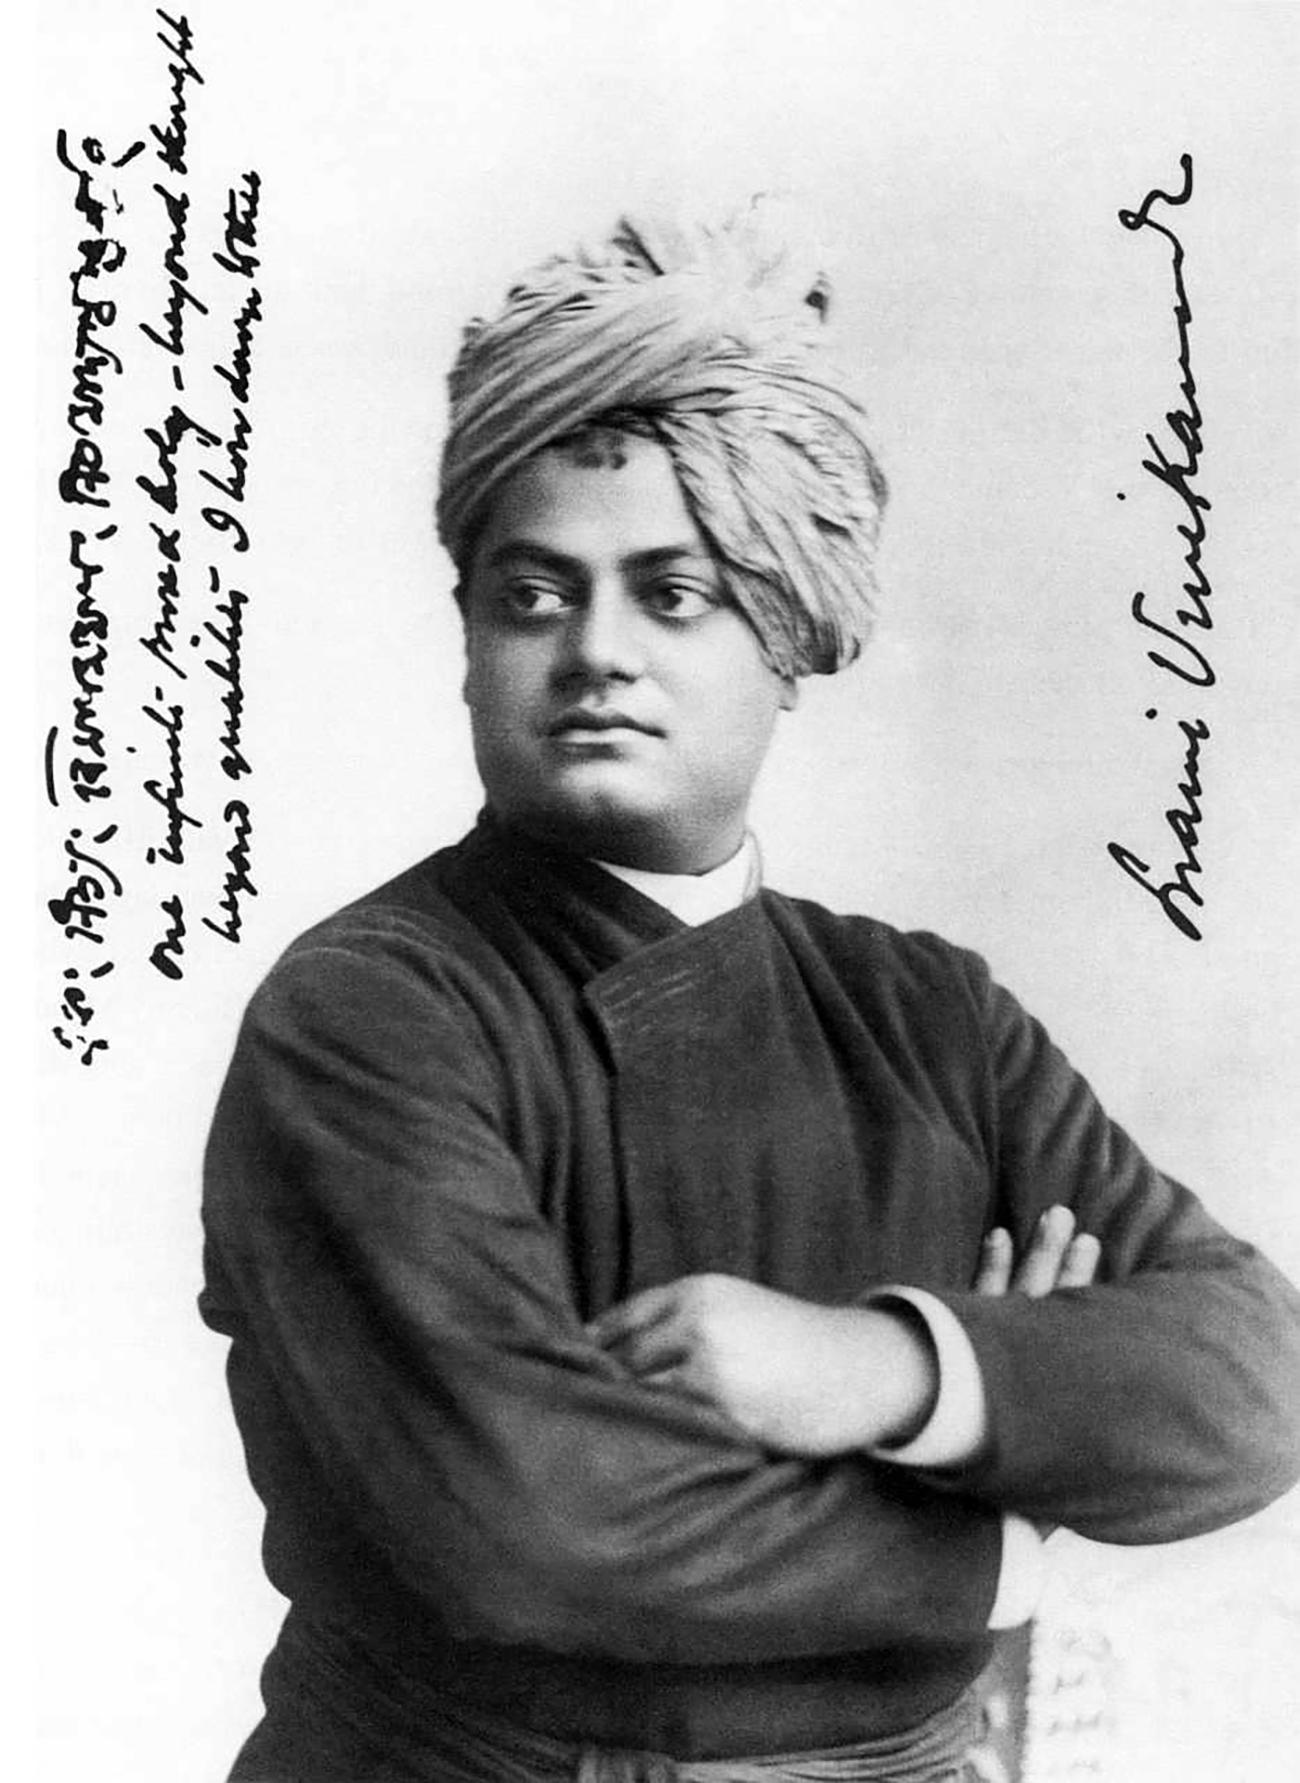 Swami Vivekananda 1893 09 signed web